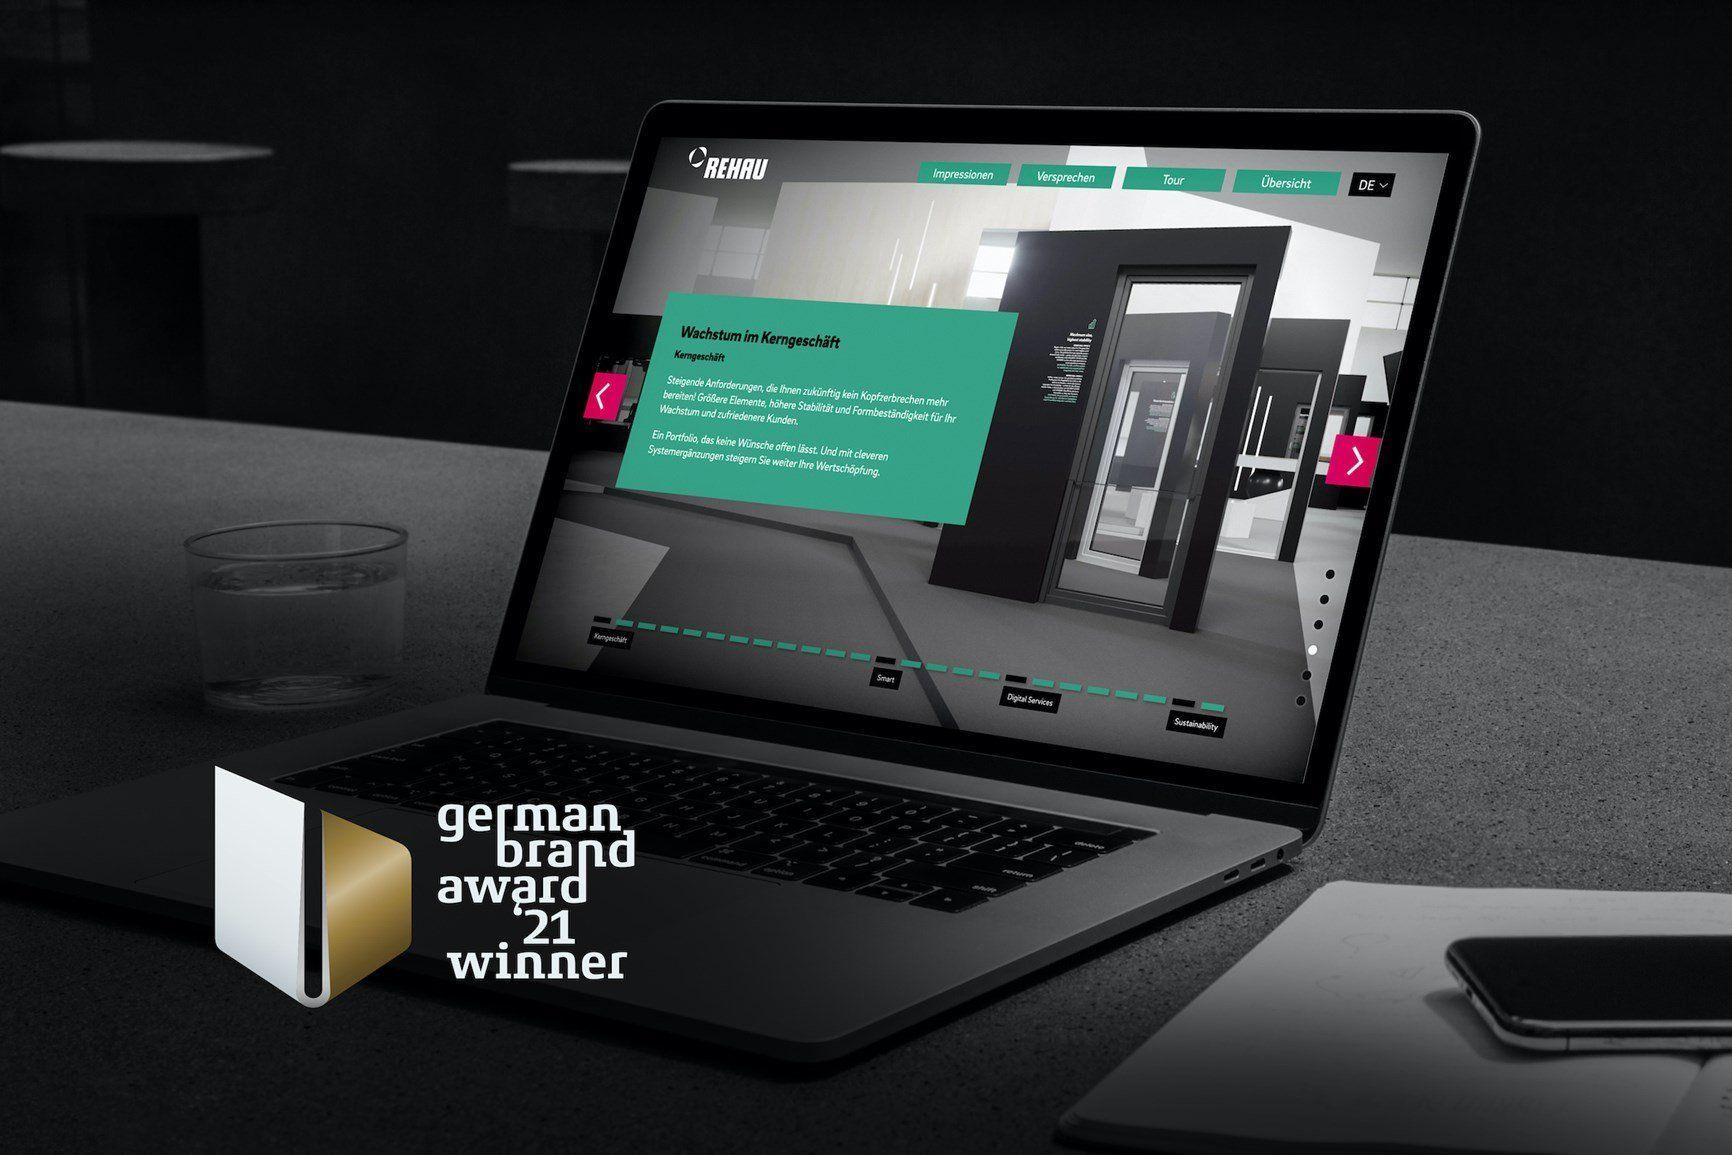 Rehau si aggiudica il German Brand Award 2021